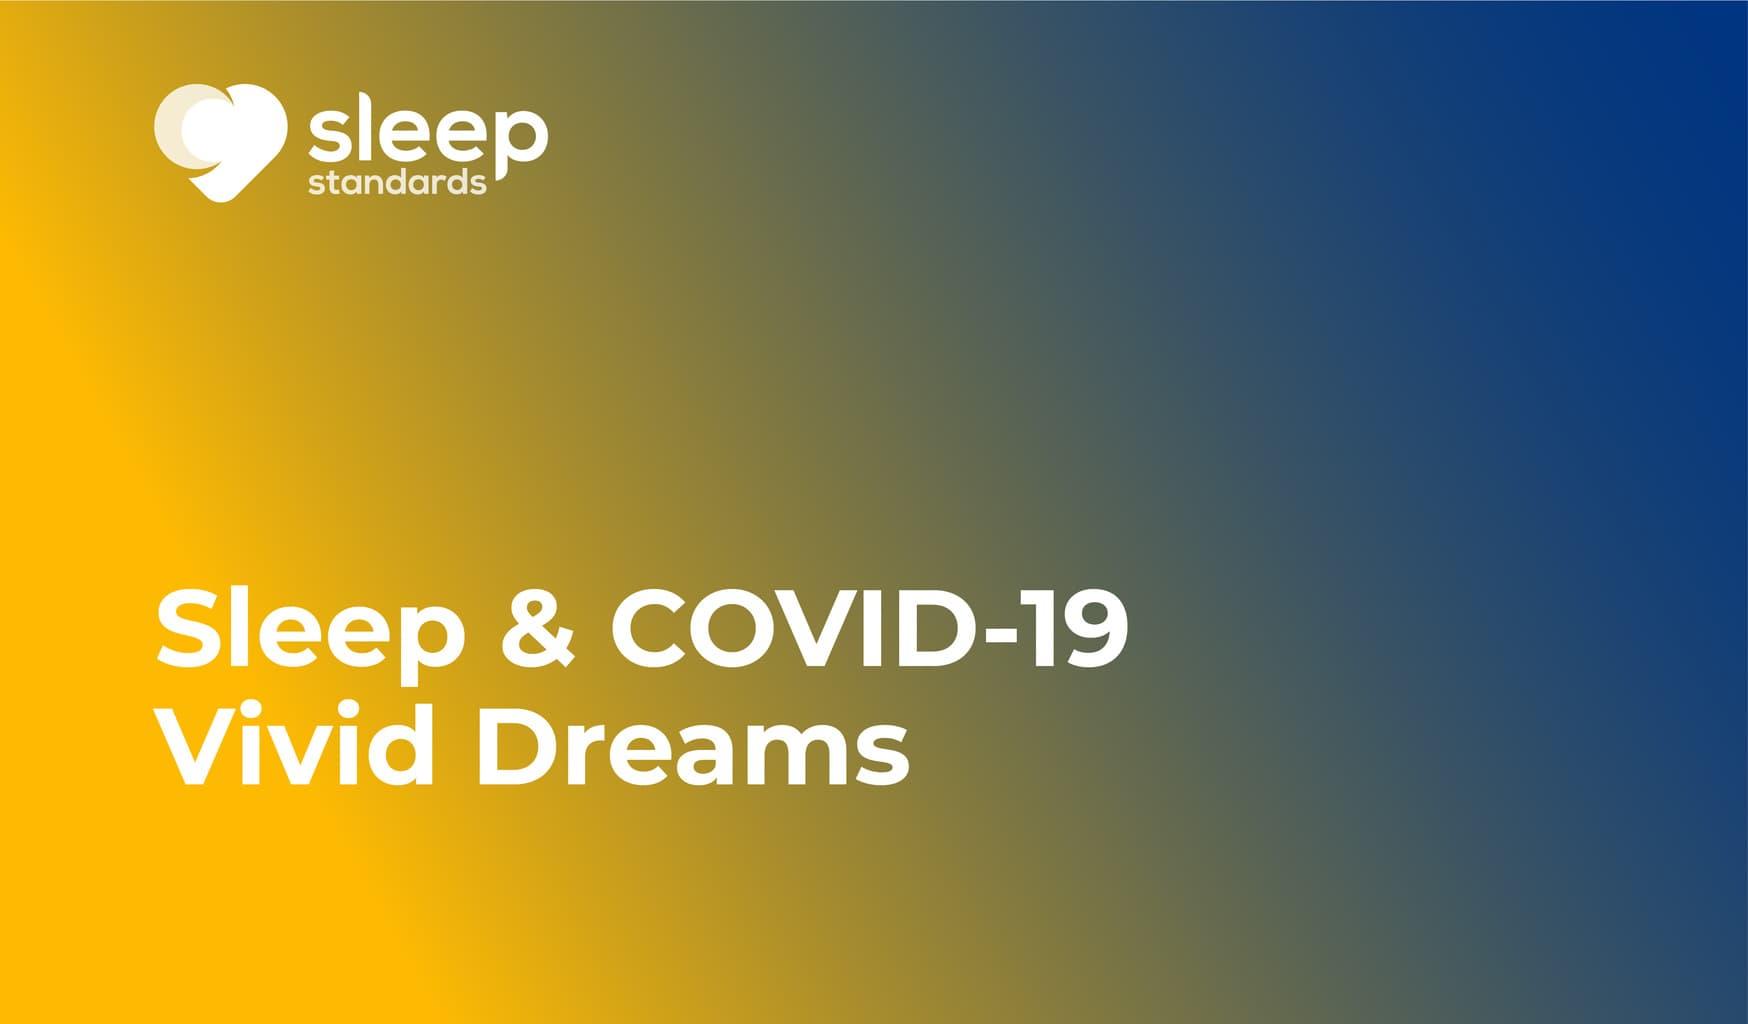 Sleep And COVID-19 Vivid Dreams